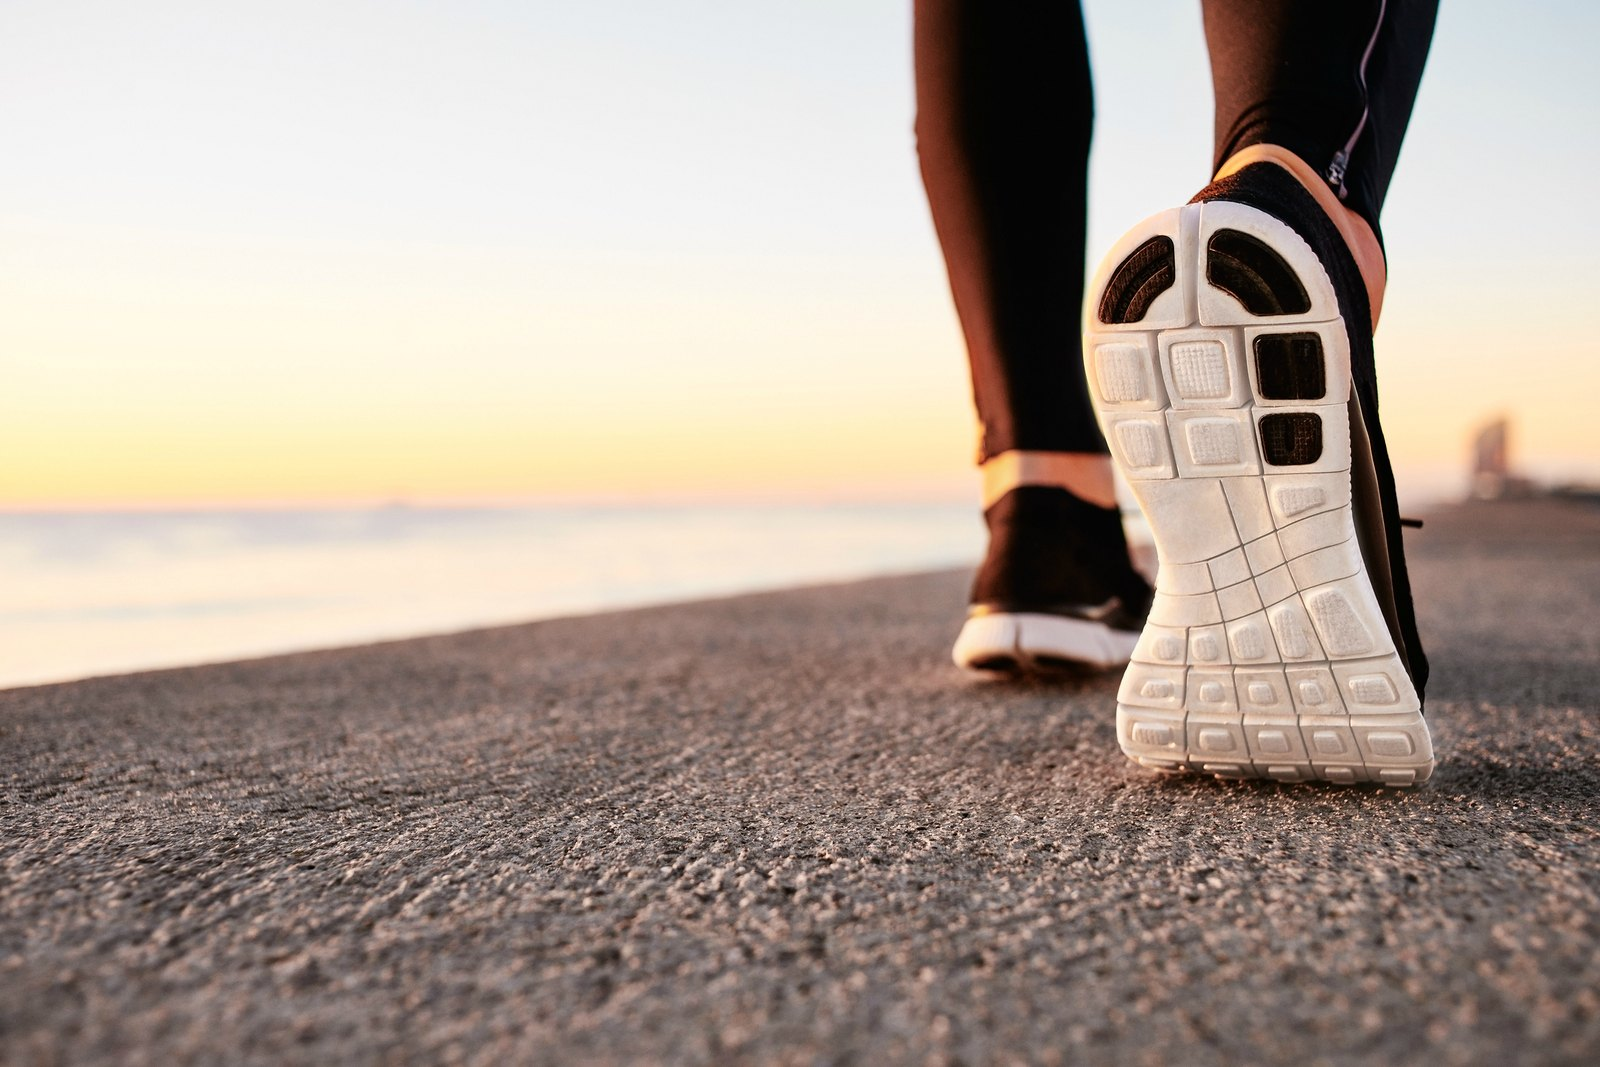 bigstock-runner-man-feet-running-on-roa-82929971.jpg